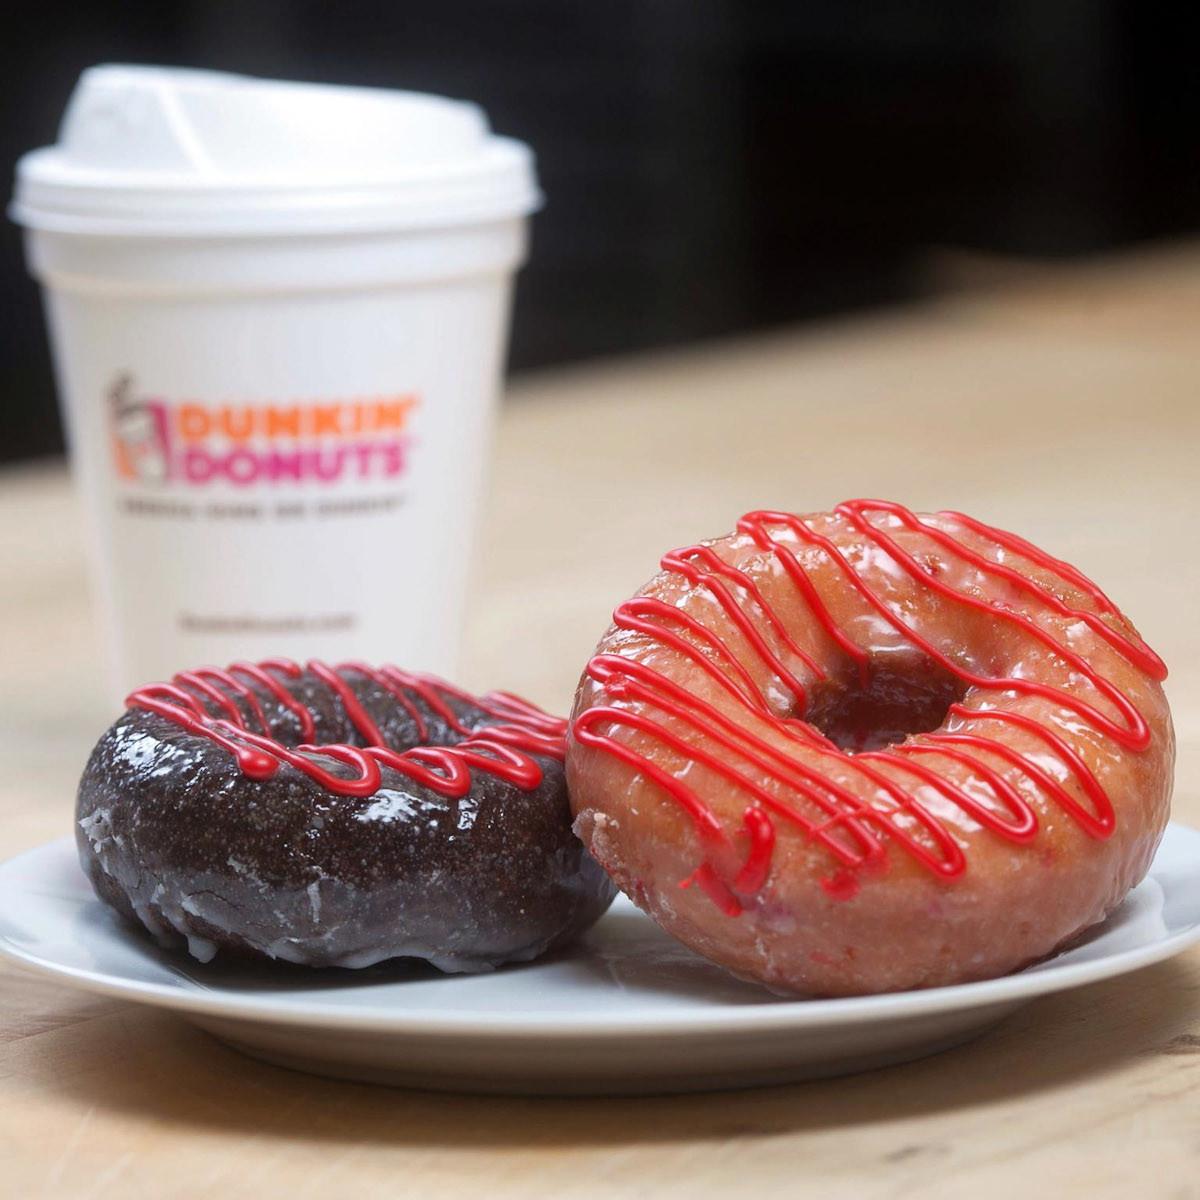 Dunkin' Donuts, doughnuts, coffee